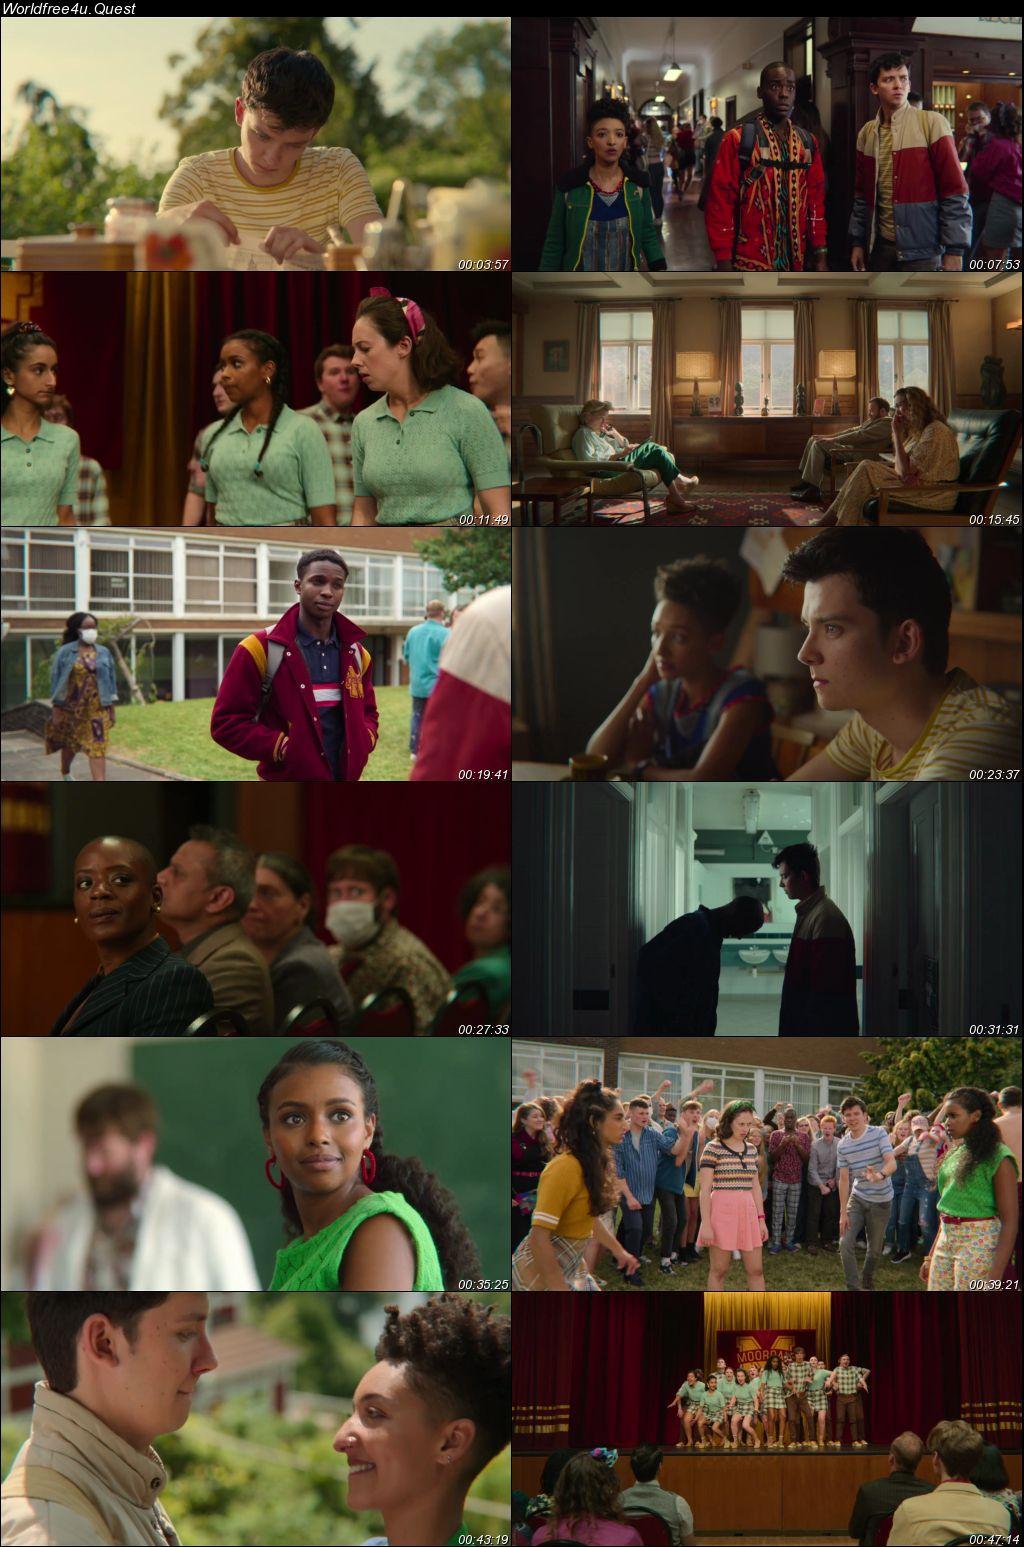 Sex Education (Season 2) WEB Series HDRip Dual Audio 720p    [Hindi-English]